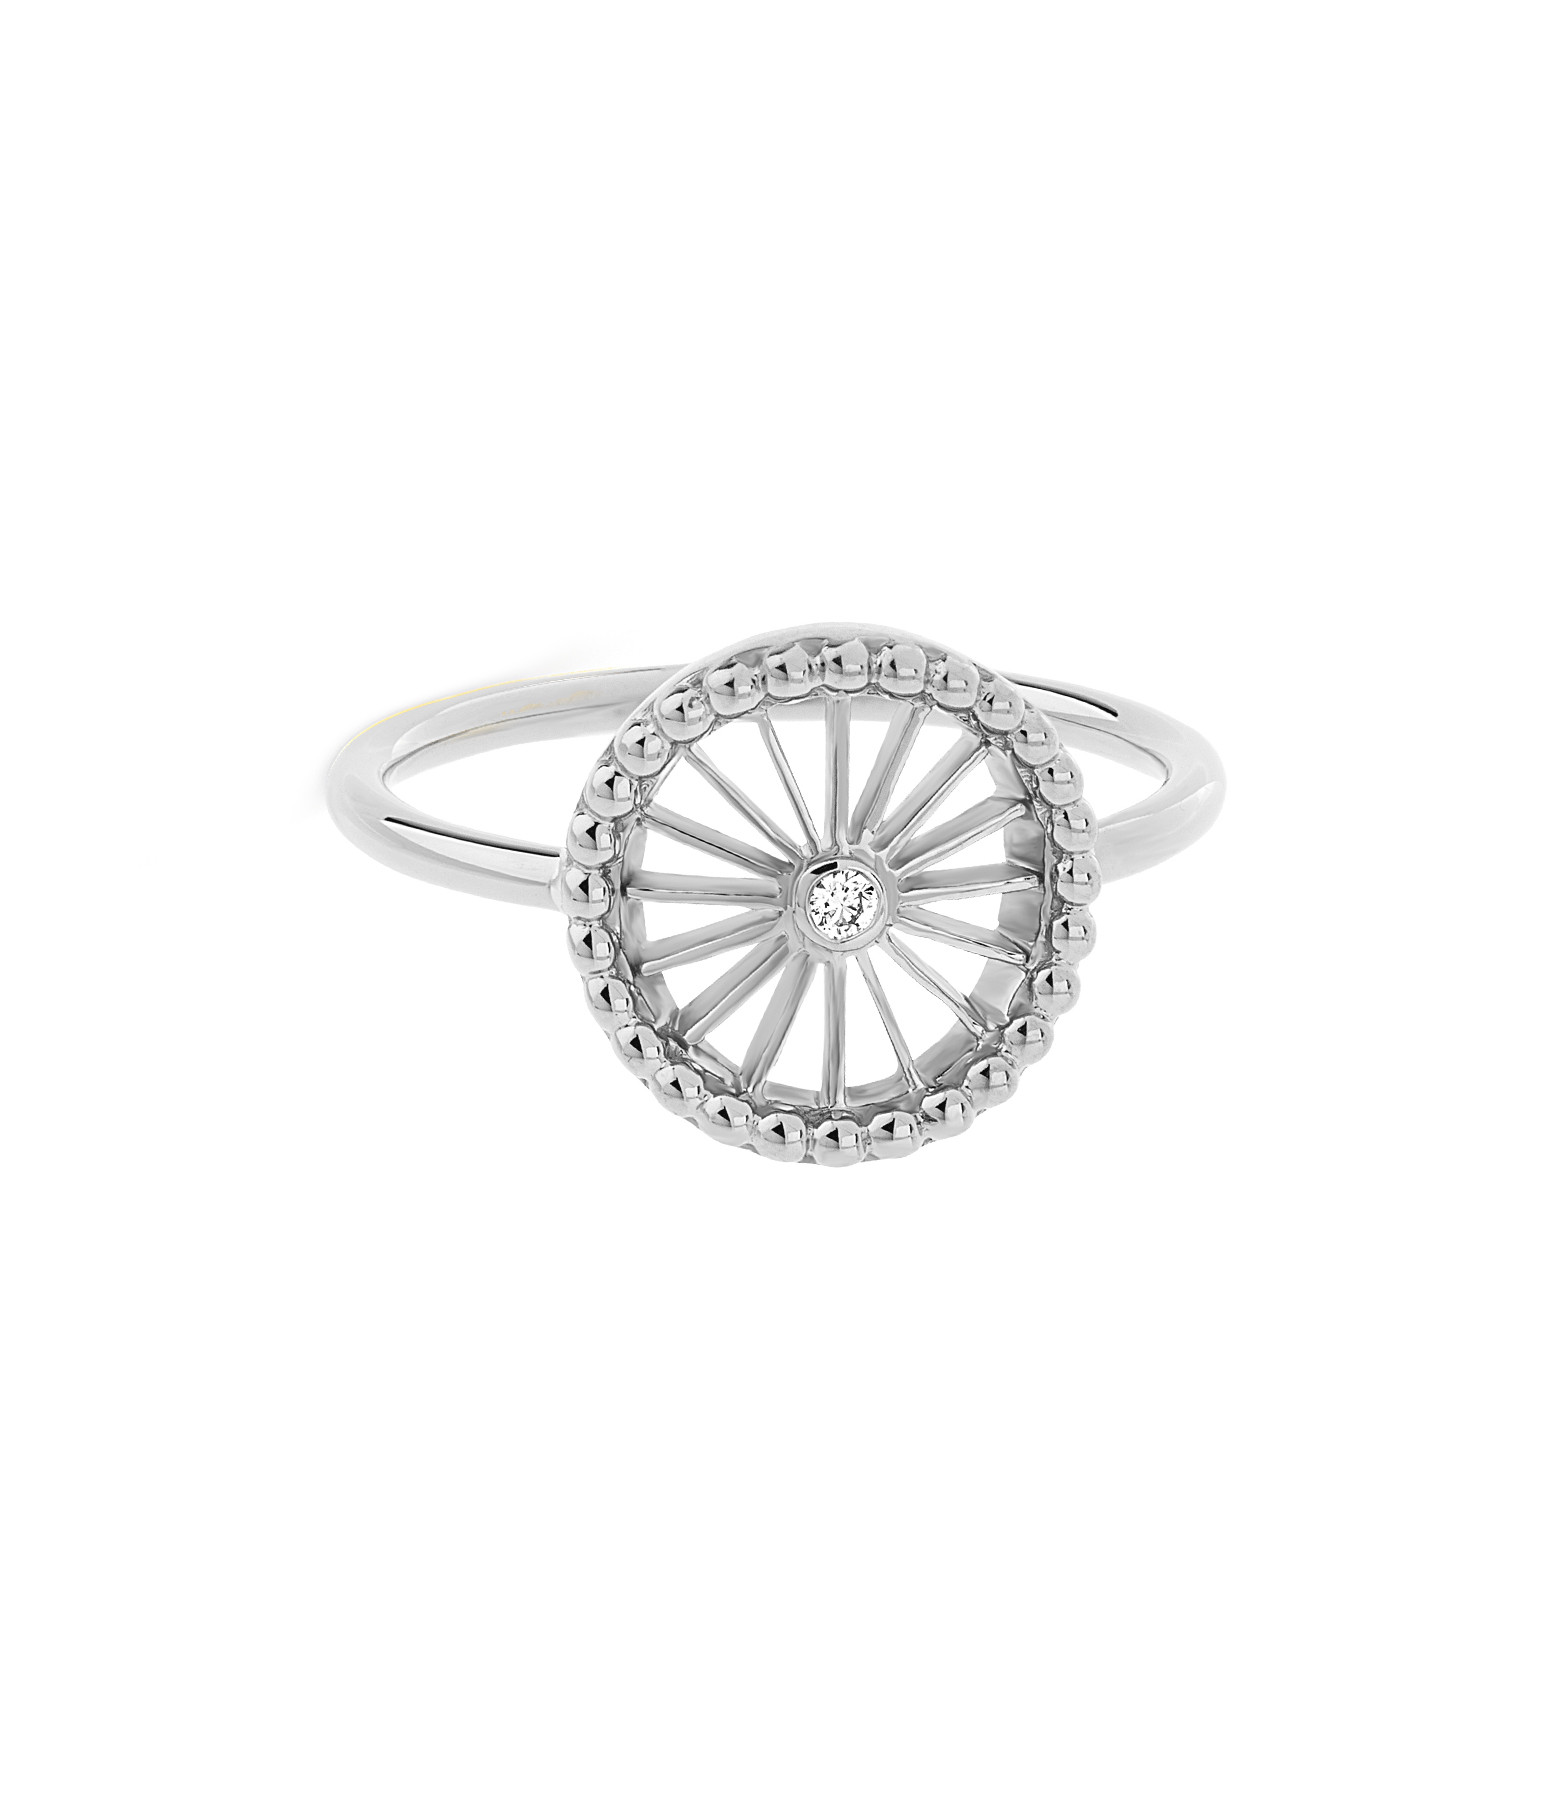 NAVA JOAILLERIE - Bague Mini-Cheyenne Ronde Diamants Or Blanc